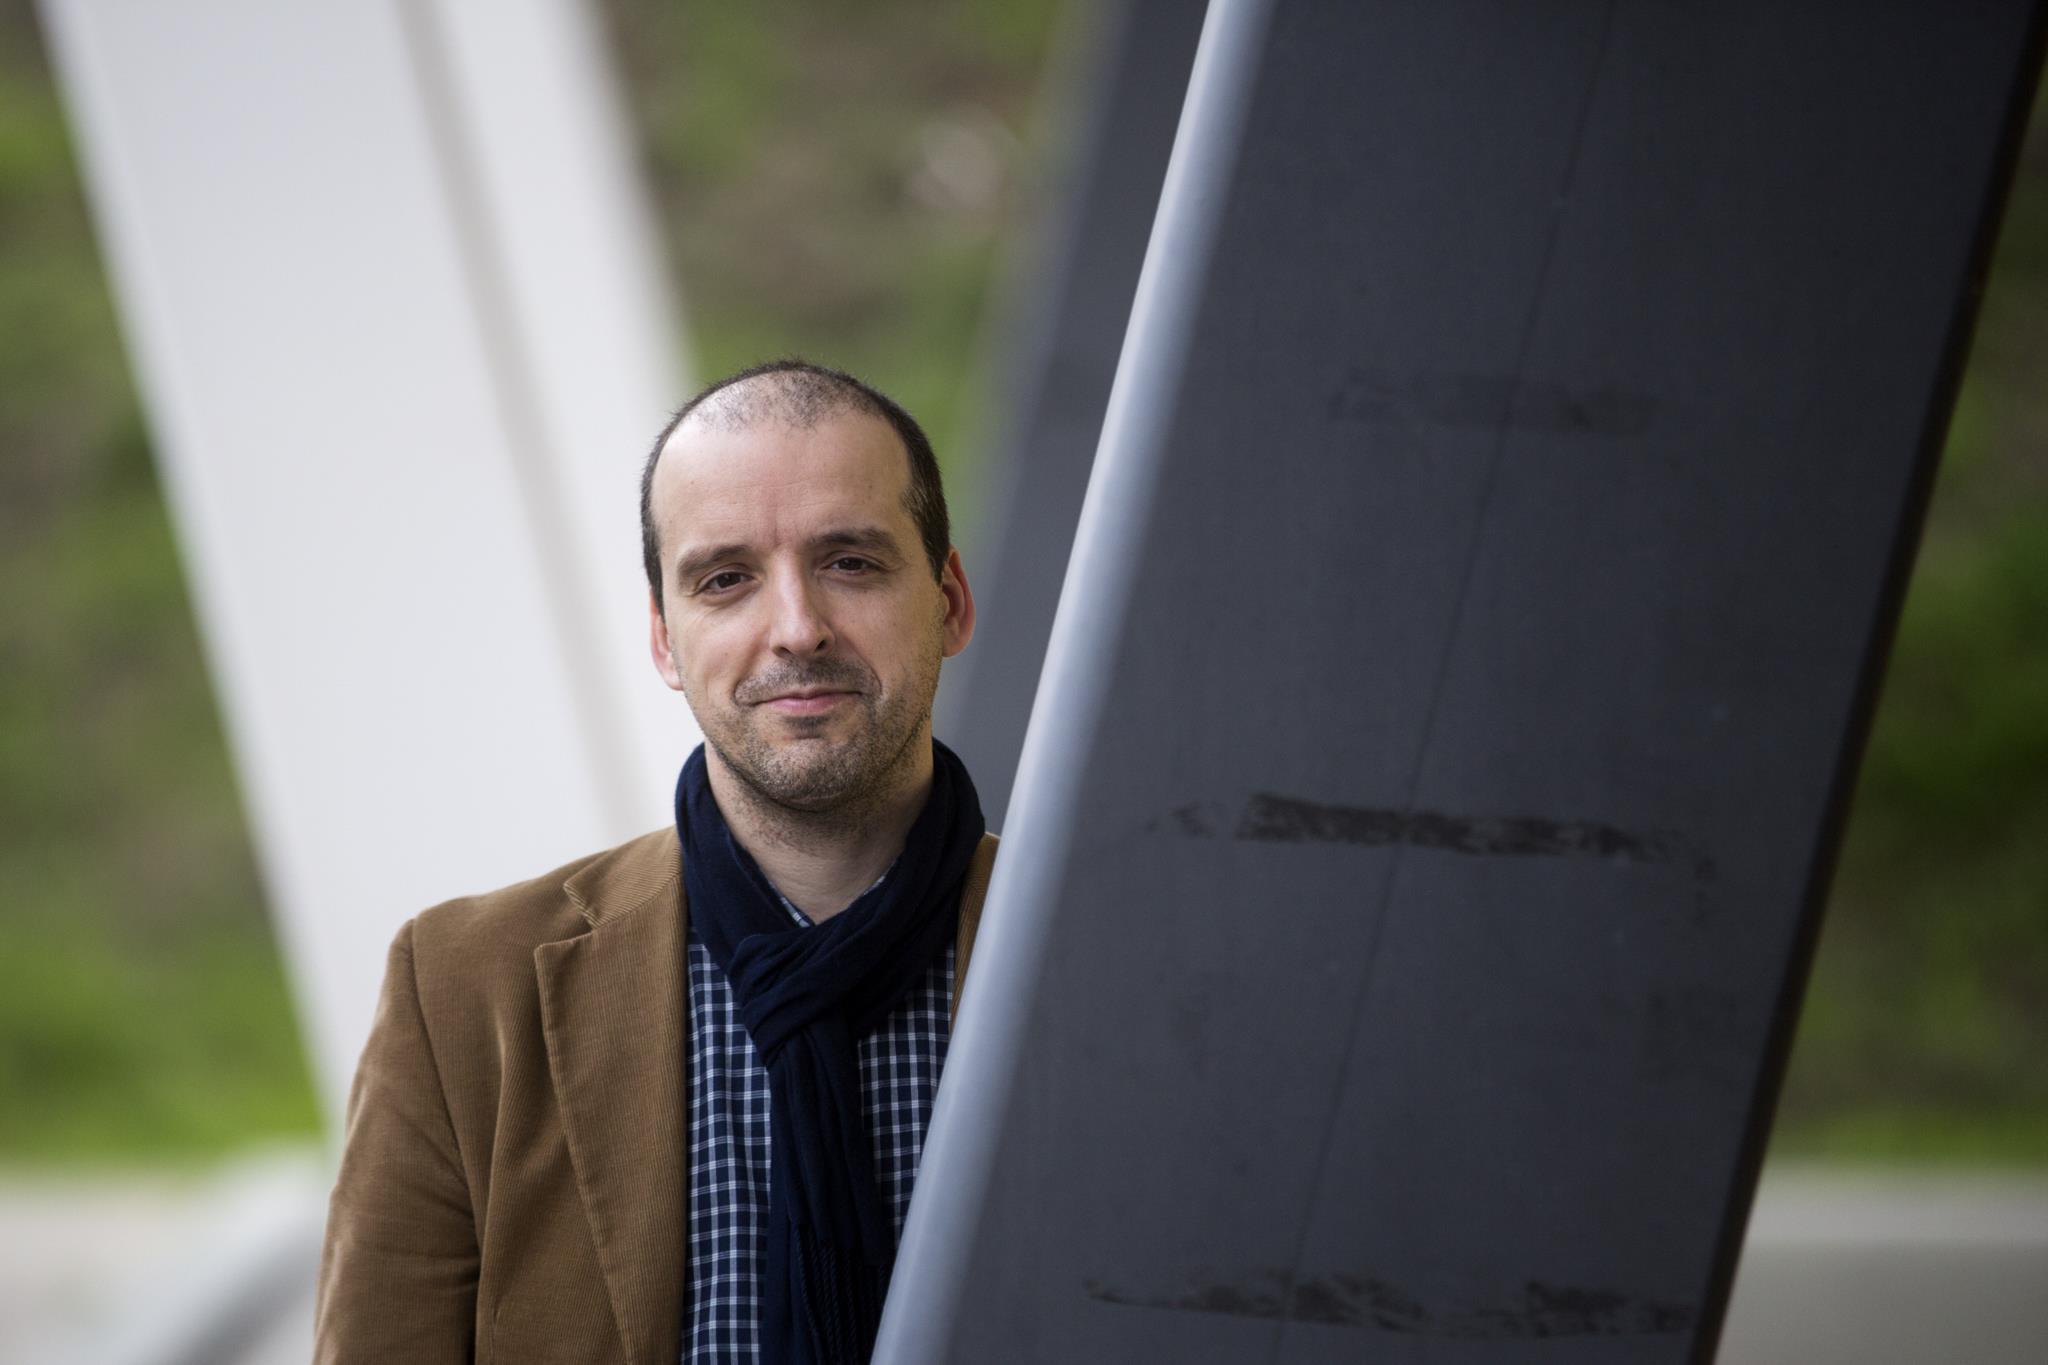 PÚBLICO - Partícula a partícula, software português dá som às batalhas de Hollywood